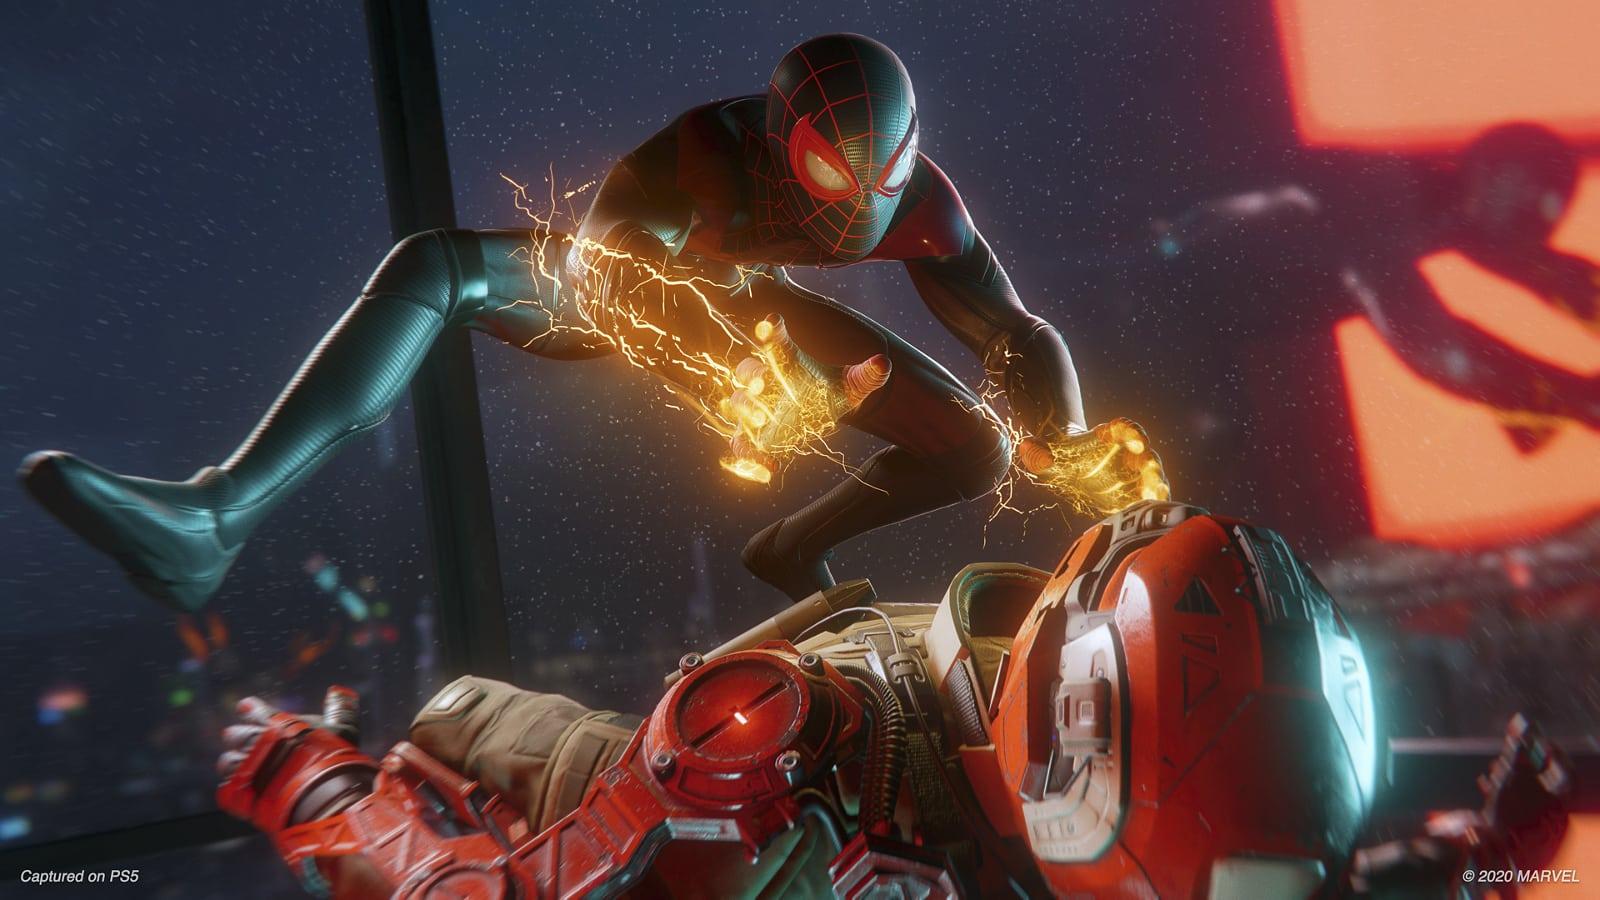 way my kid plays video games pisses me dad off Spider-Man: Miles Morales